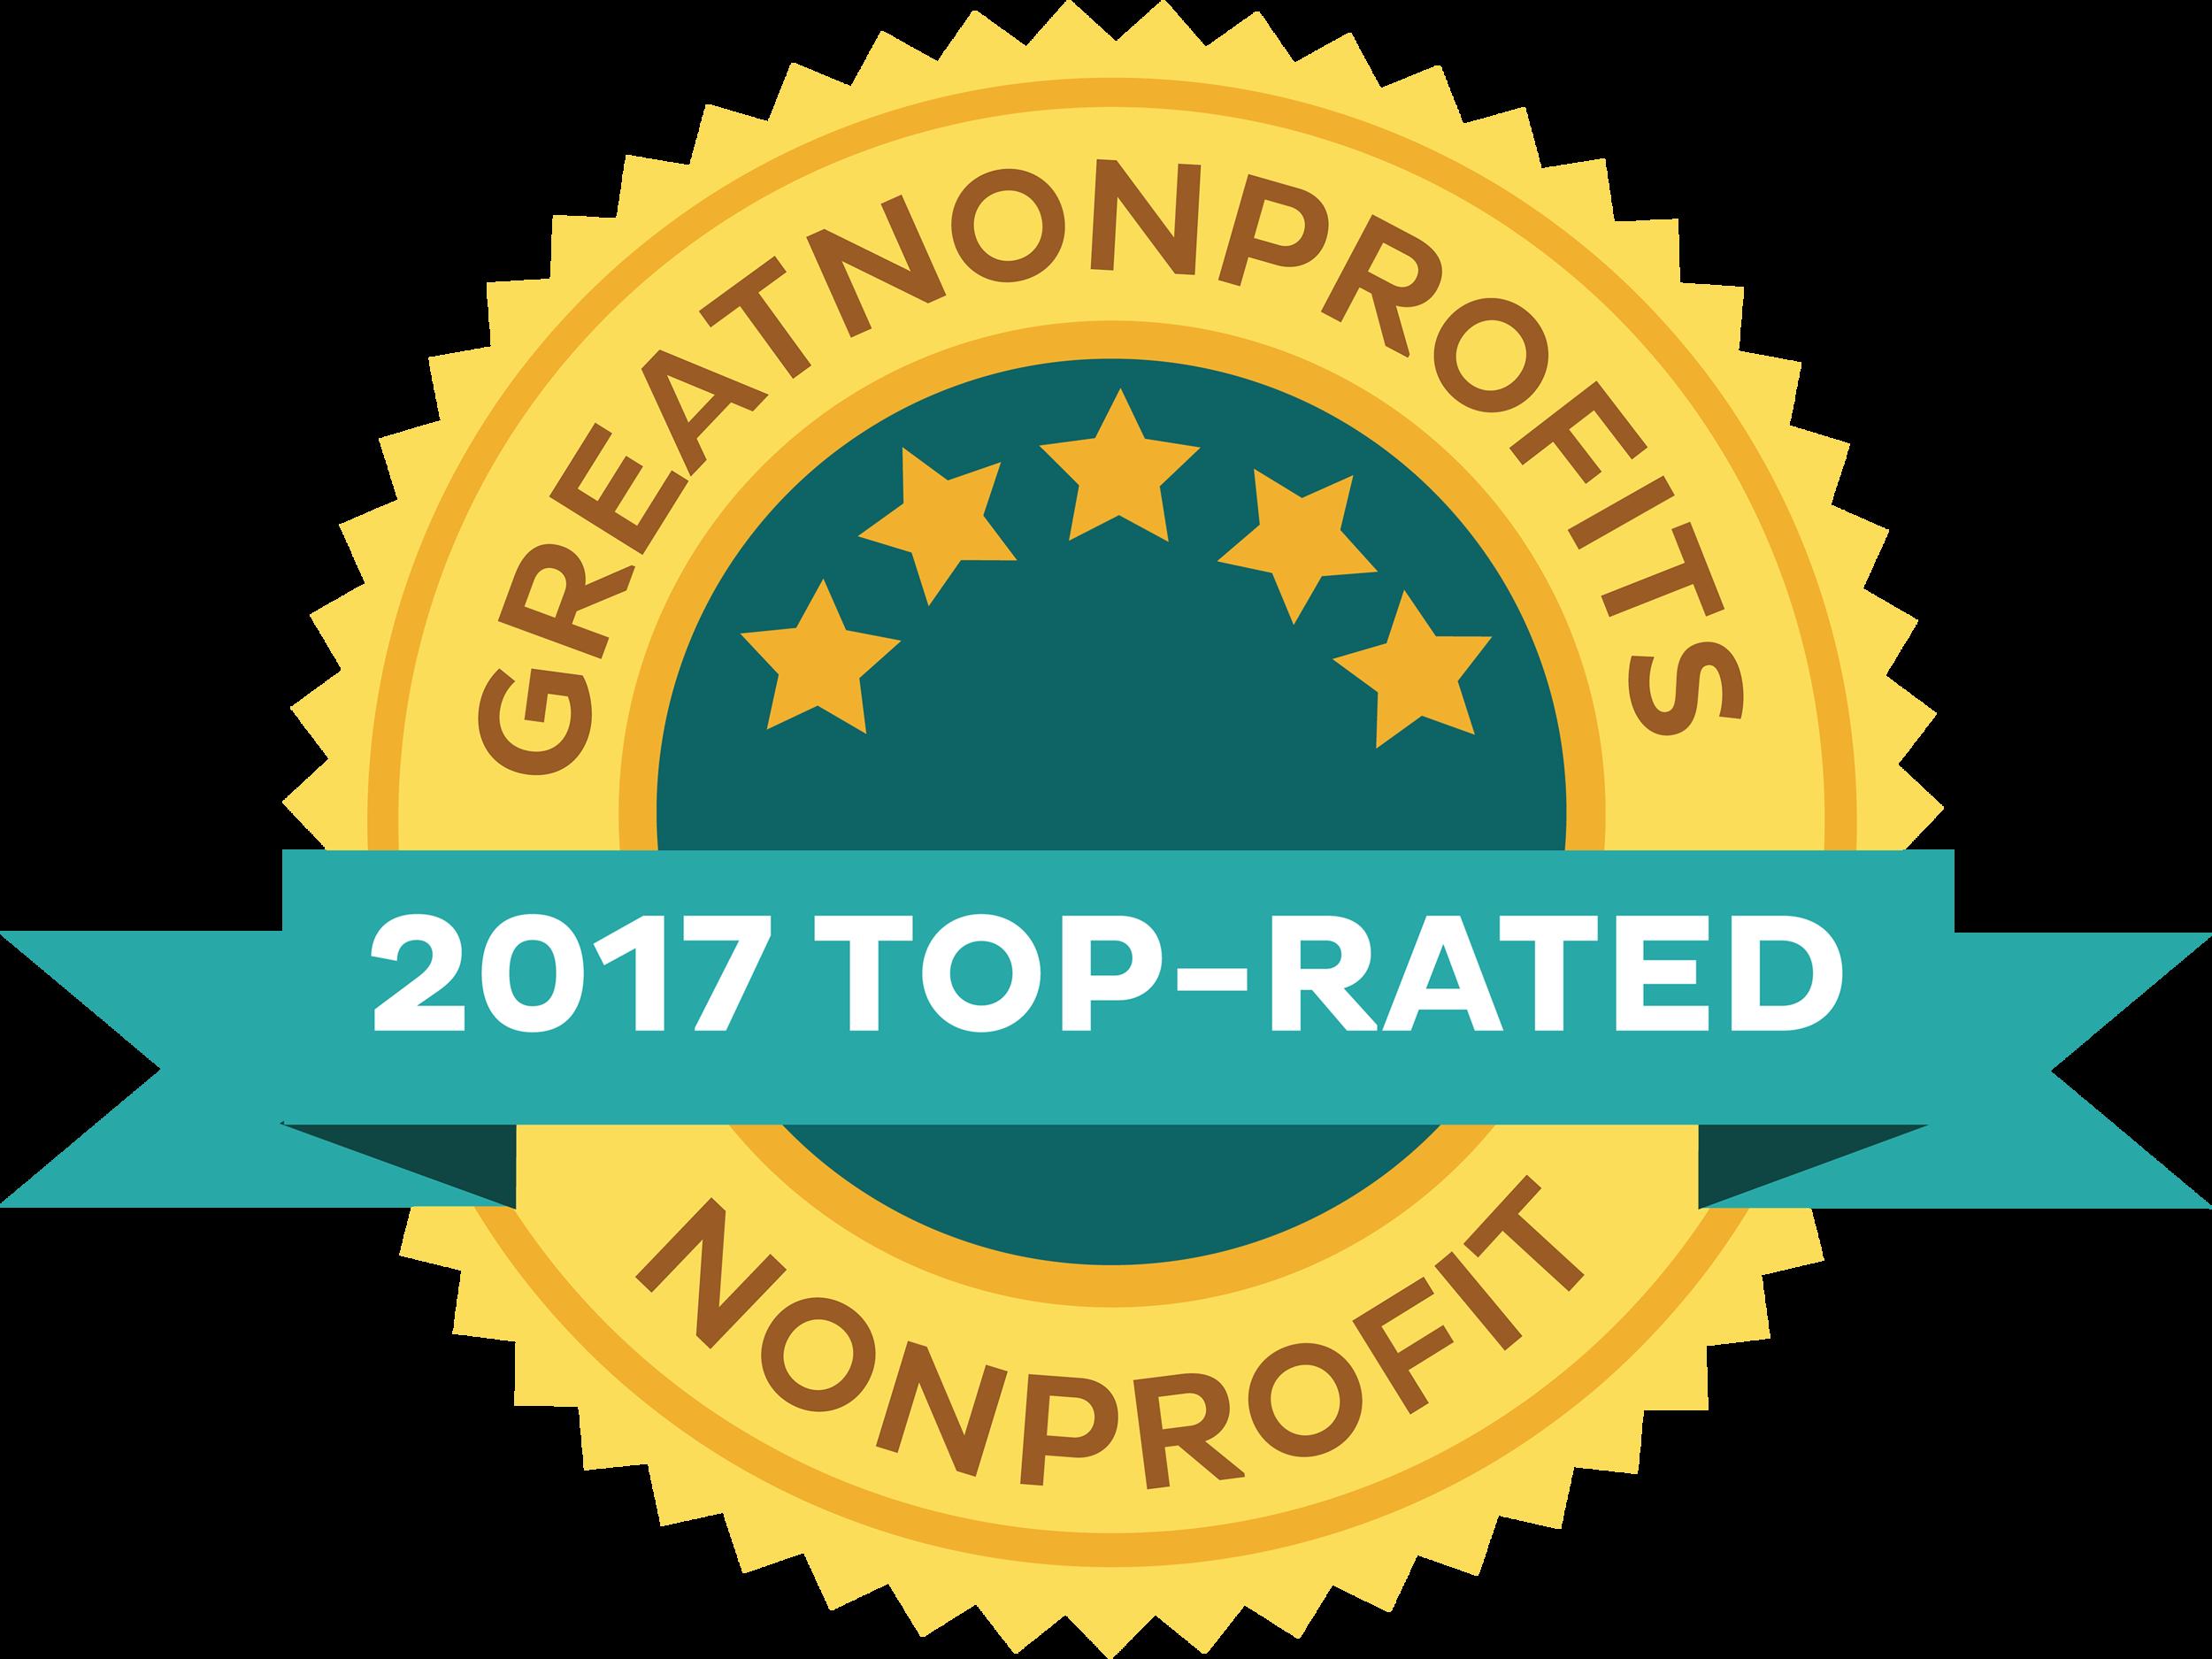 2017-top-rated-awards-badge-hi-res.png